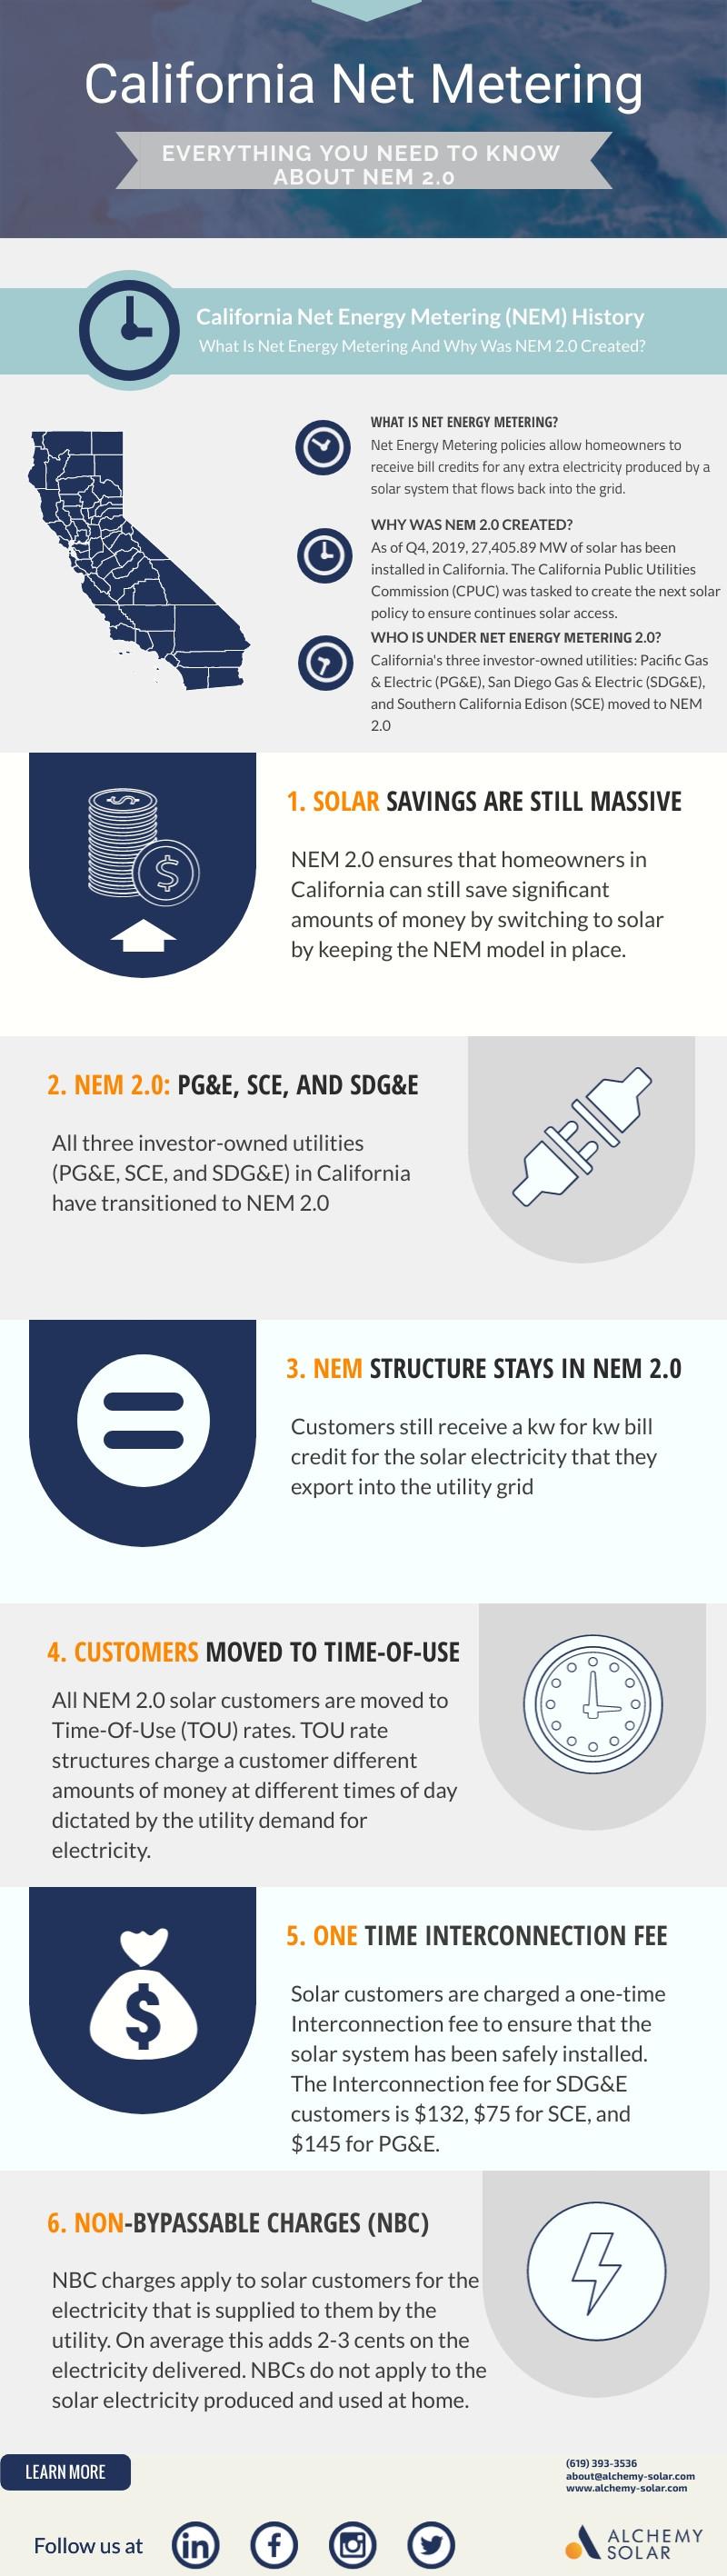 6 Reasons why California Solar Net Energy Metering (NEM) 2.0 allows solar to still make sense for California homeowners.